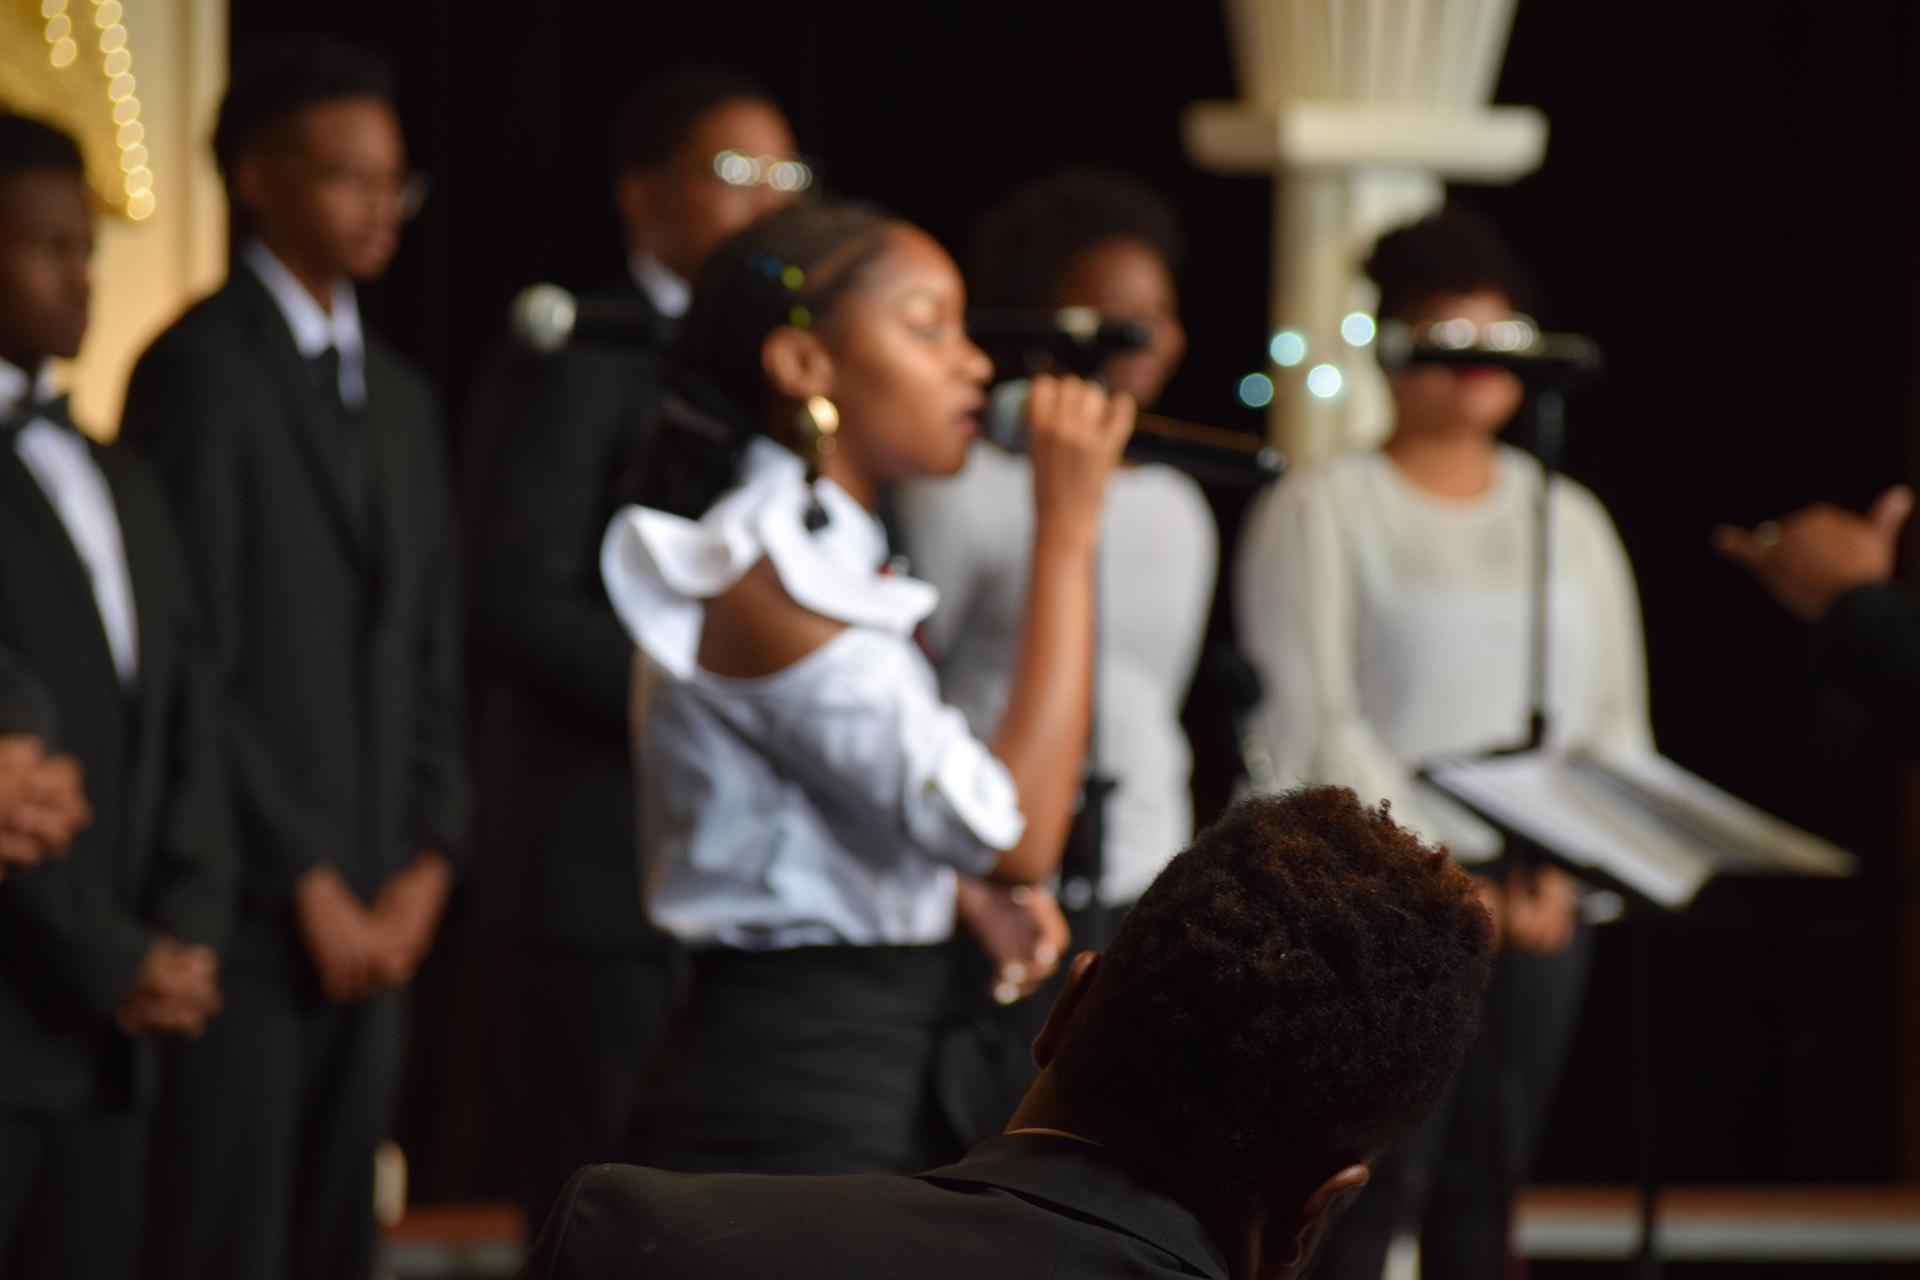 Natchez-Adams School District Choir 2019